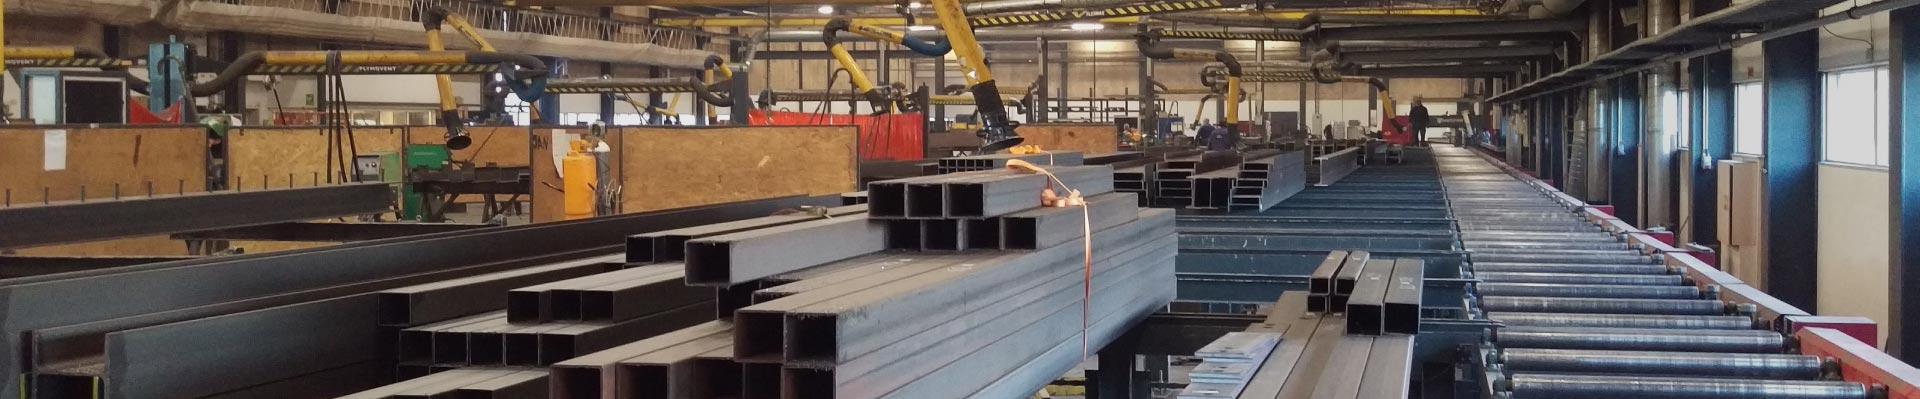 Online Auction – Honeywell - Steel Fabrication, Garage Workshop Equipment and Internal Transport